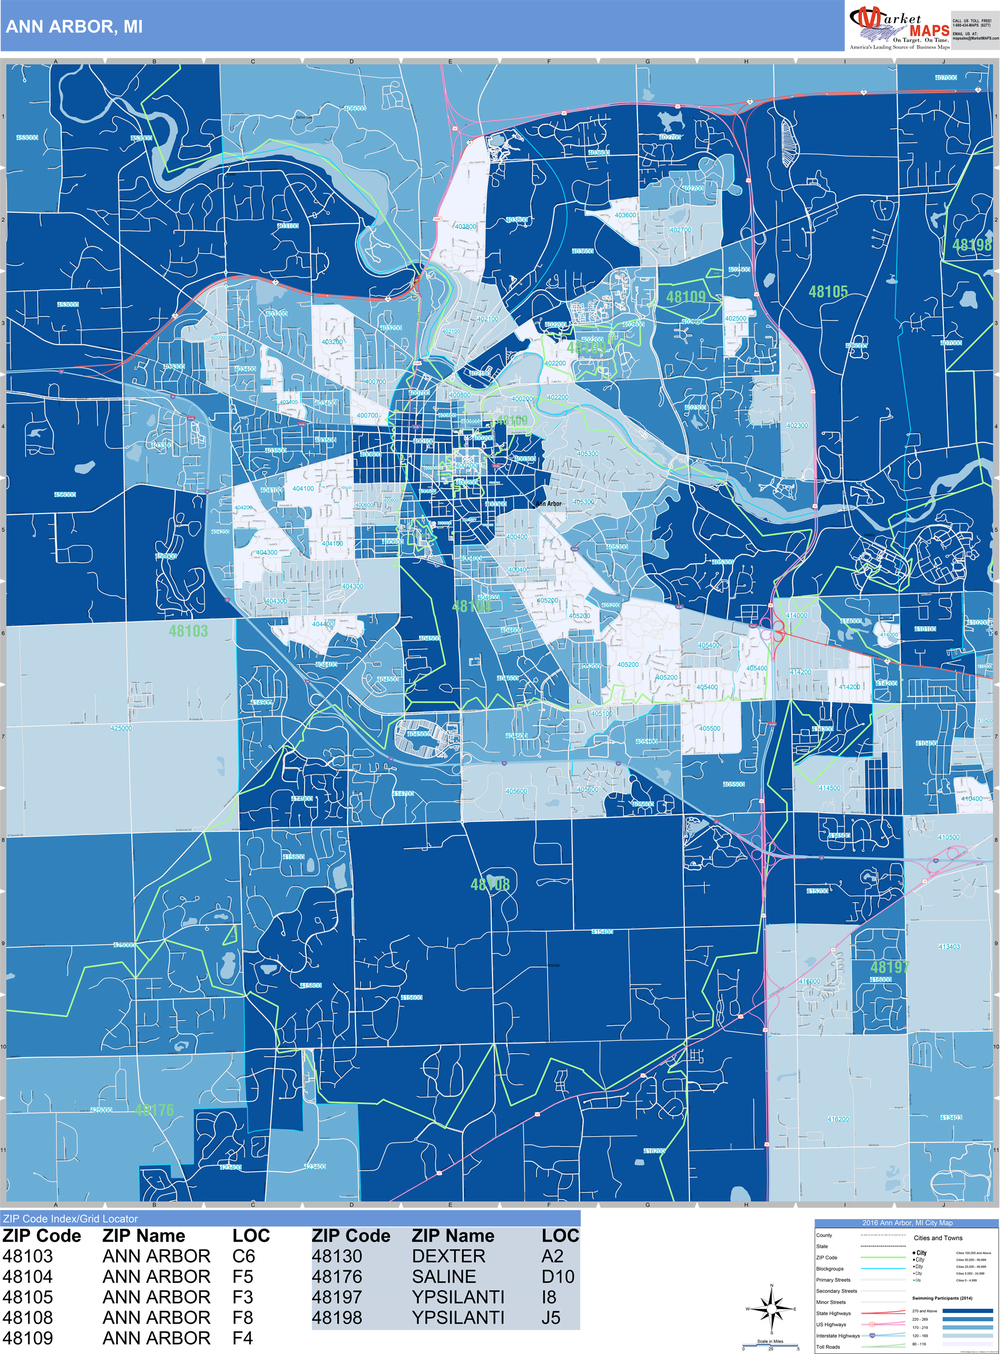 3-25-16 Ann Arbor map.jpg